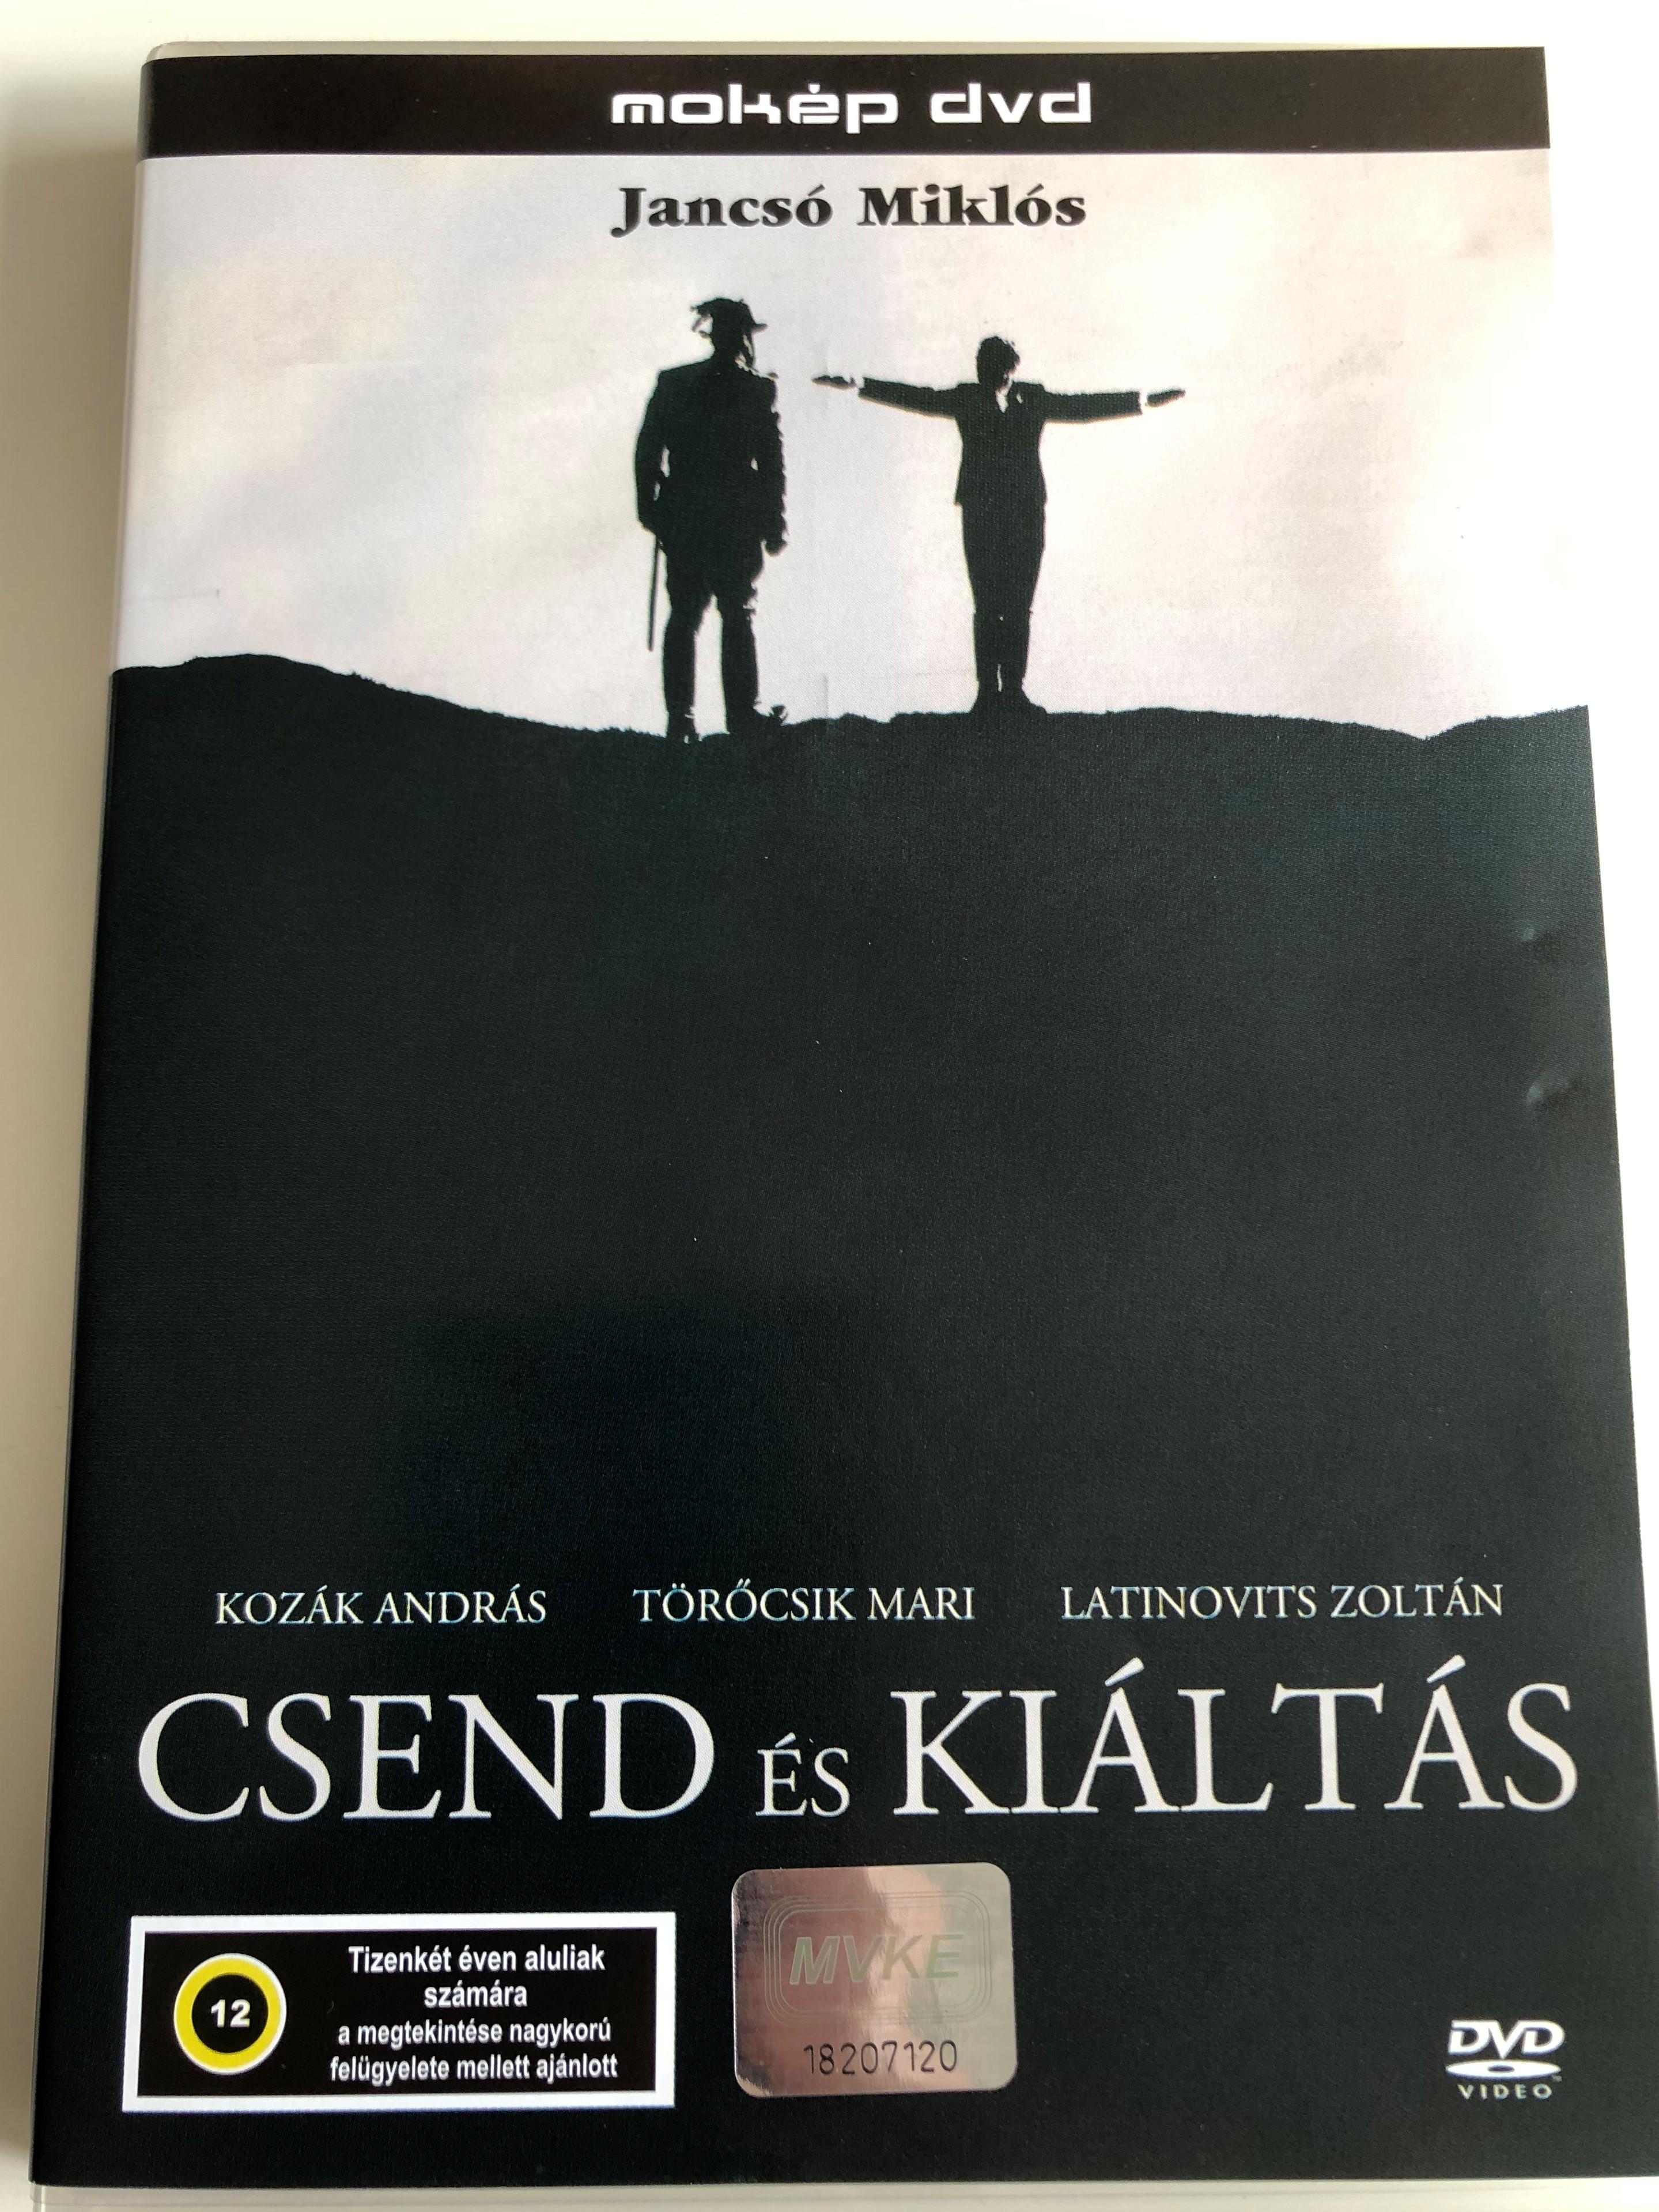 -csend-s-ki-lt-s-dvd-1968-silence-and-cry-directed-by-mikl-s-jancs-starring-koz-k-andr-s-t-r-csik-mari-latinovits-zolt-n-1-.jpg